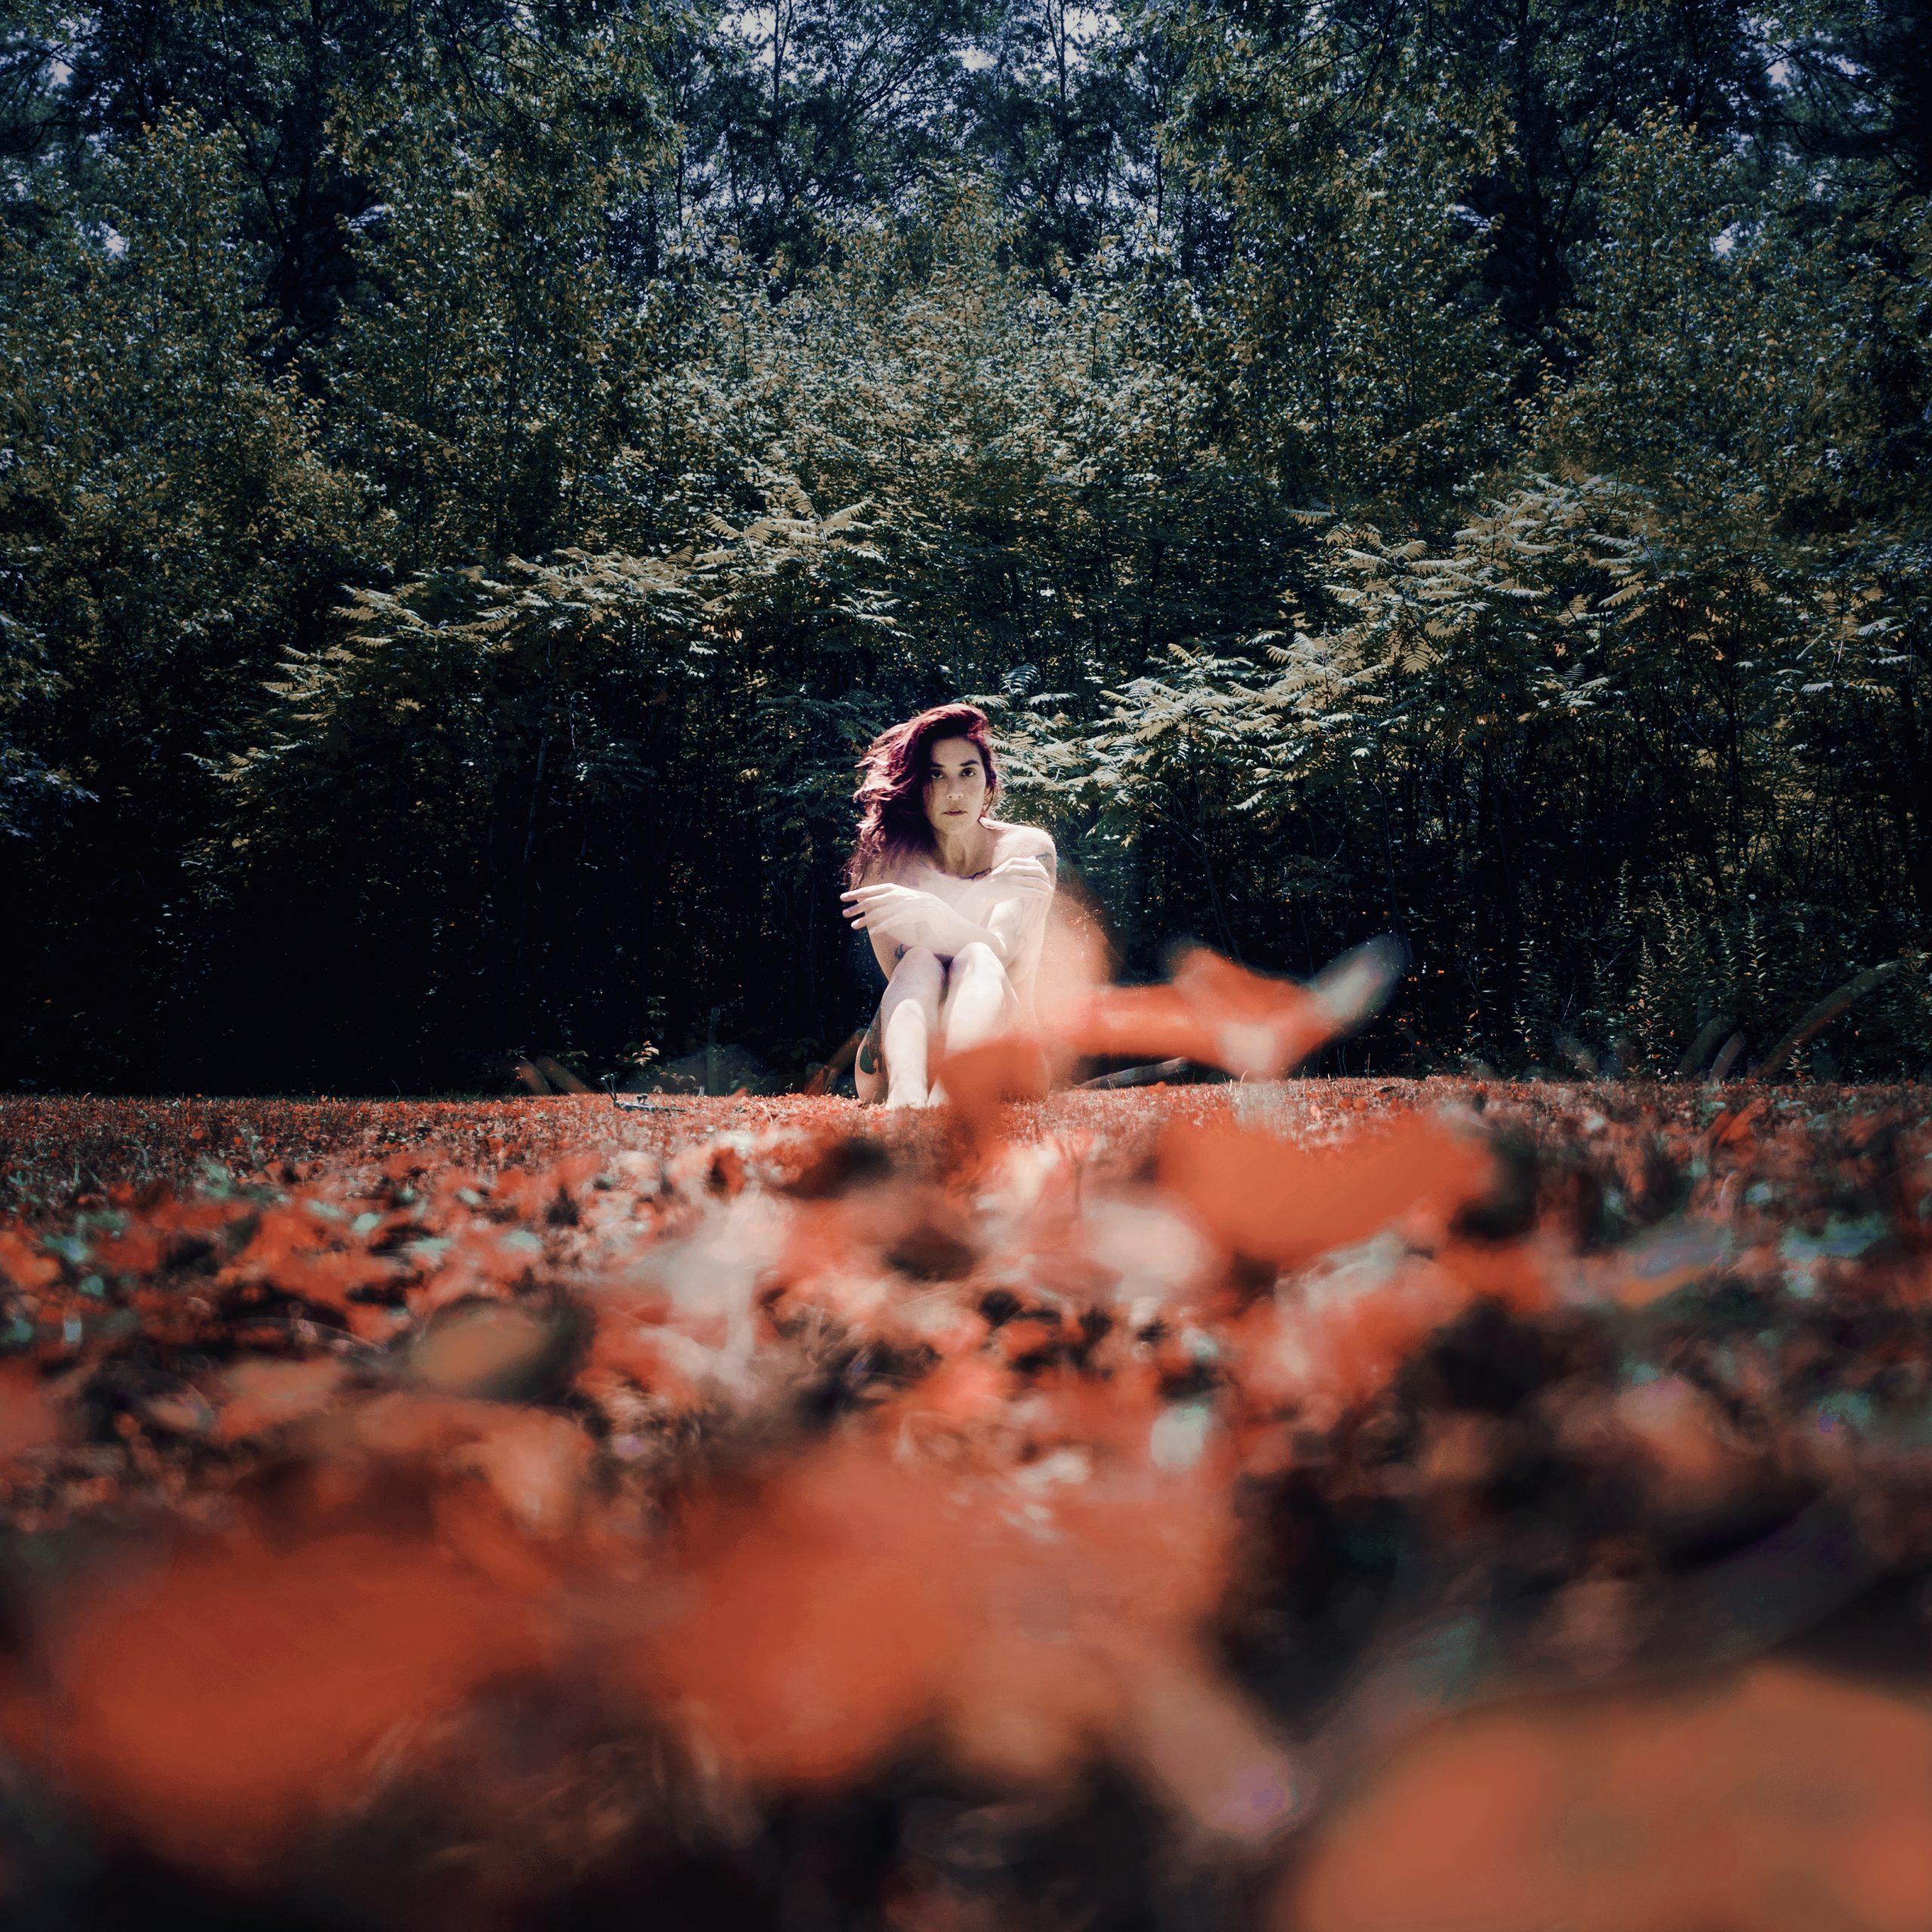 nude girl in grass